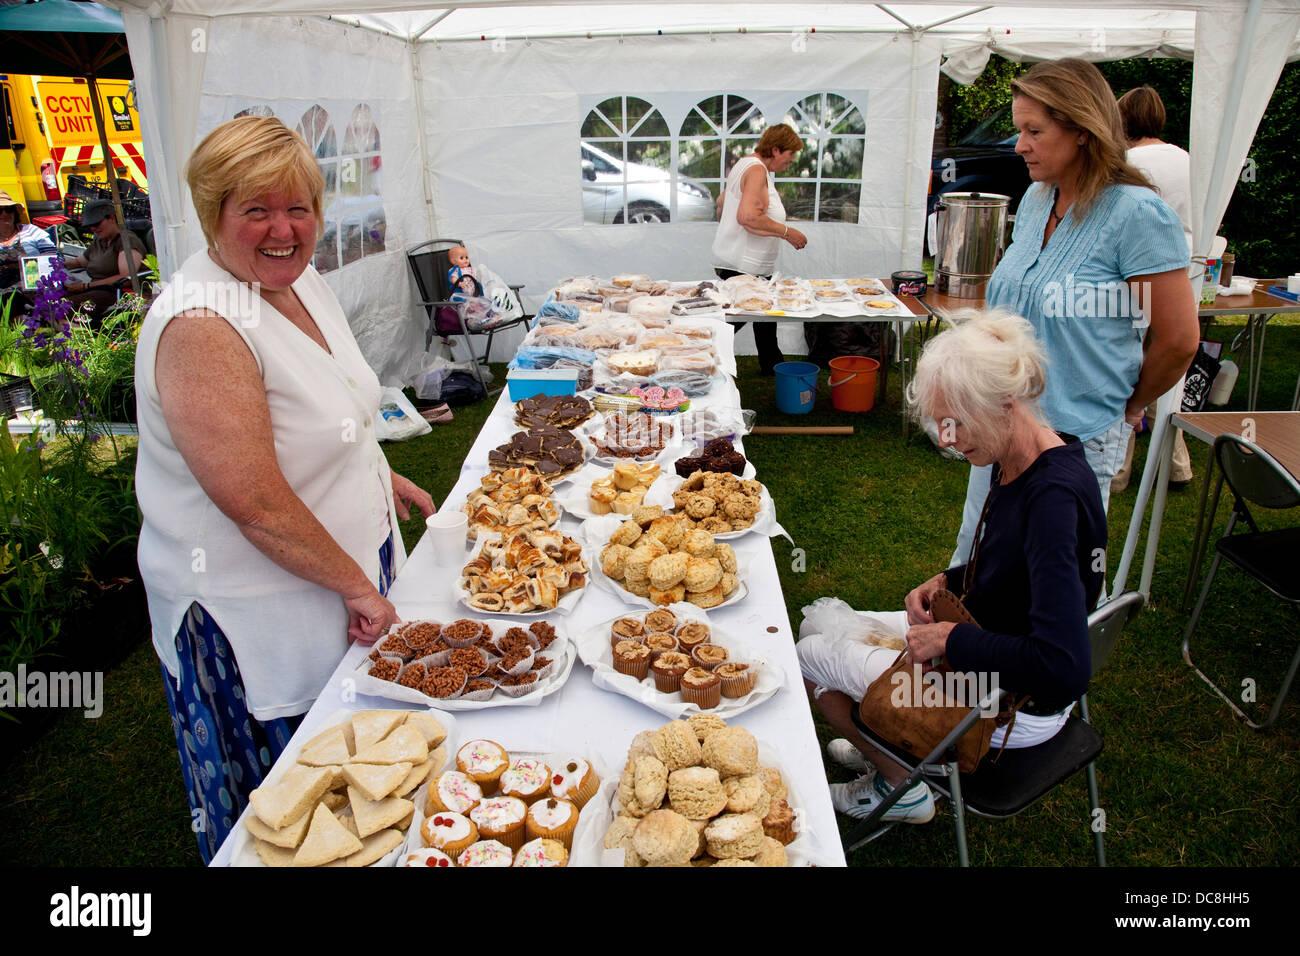 Cake Stall, Fairwarp Village Fete, Fairwarp, Sussex, England - Stock Image